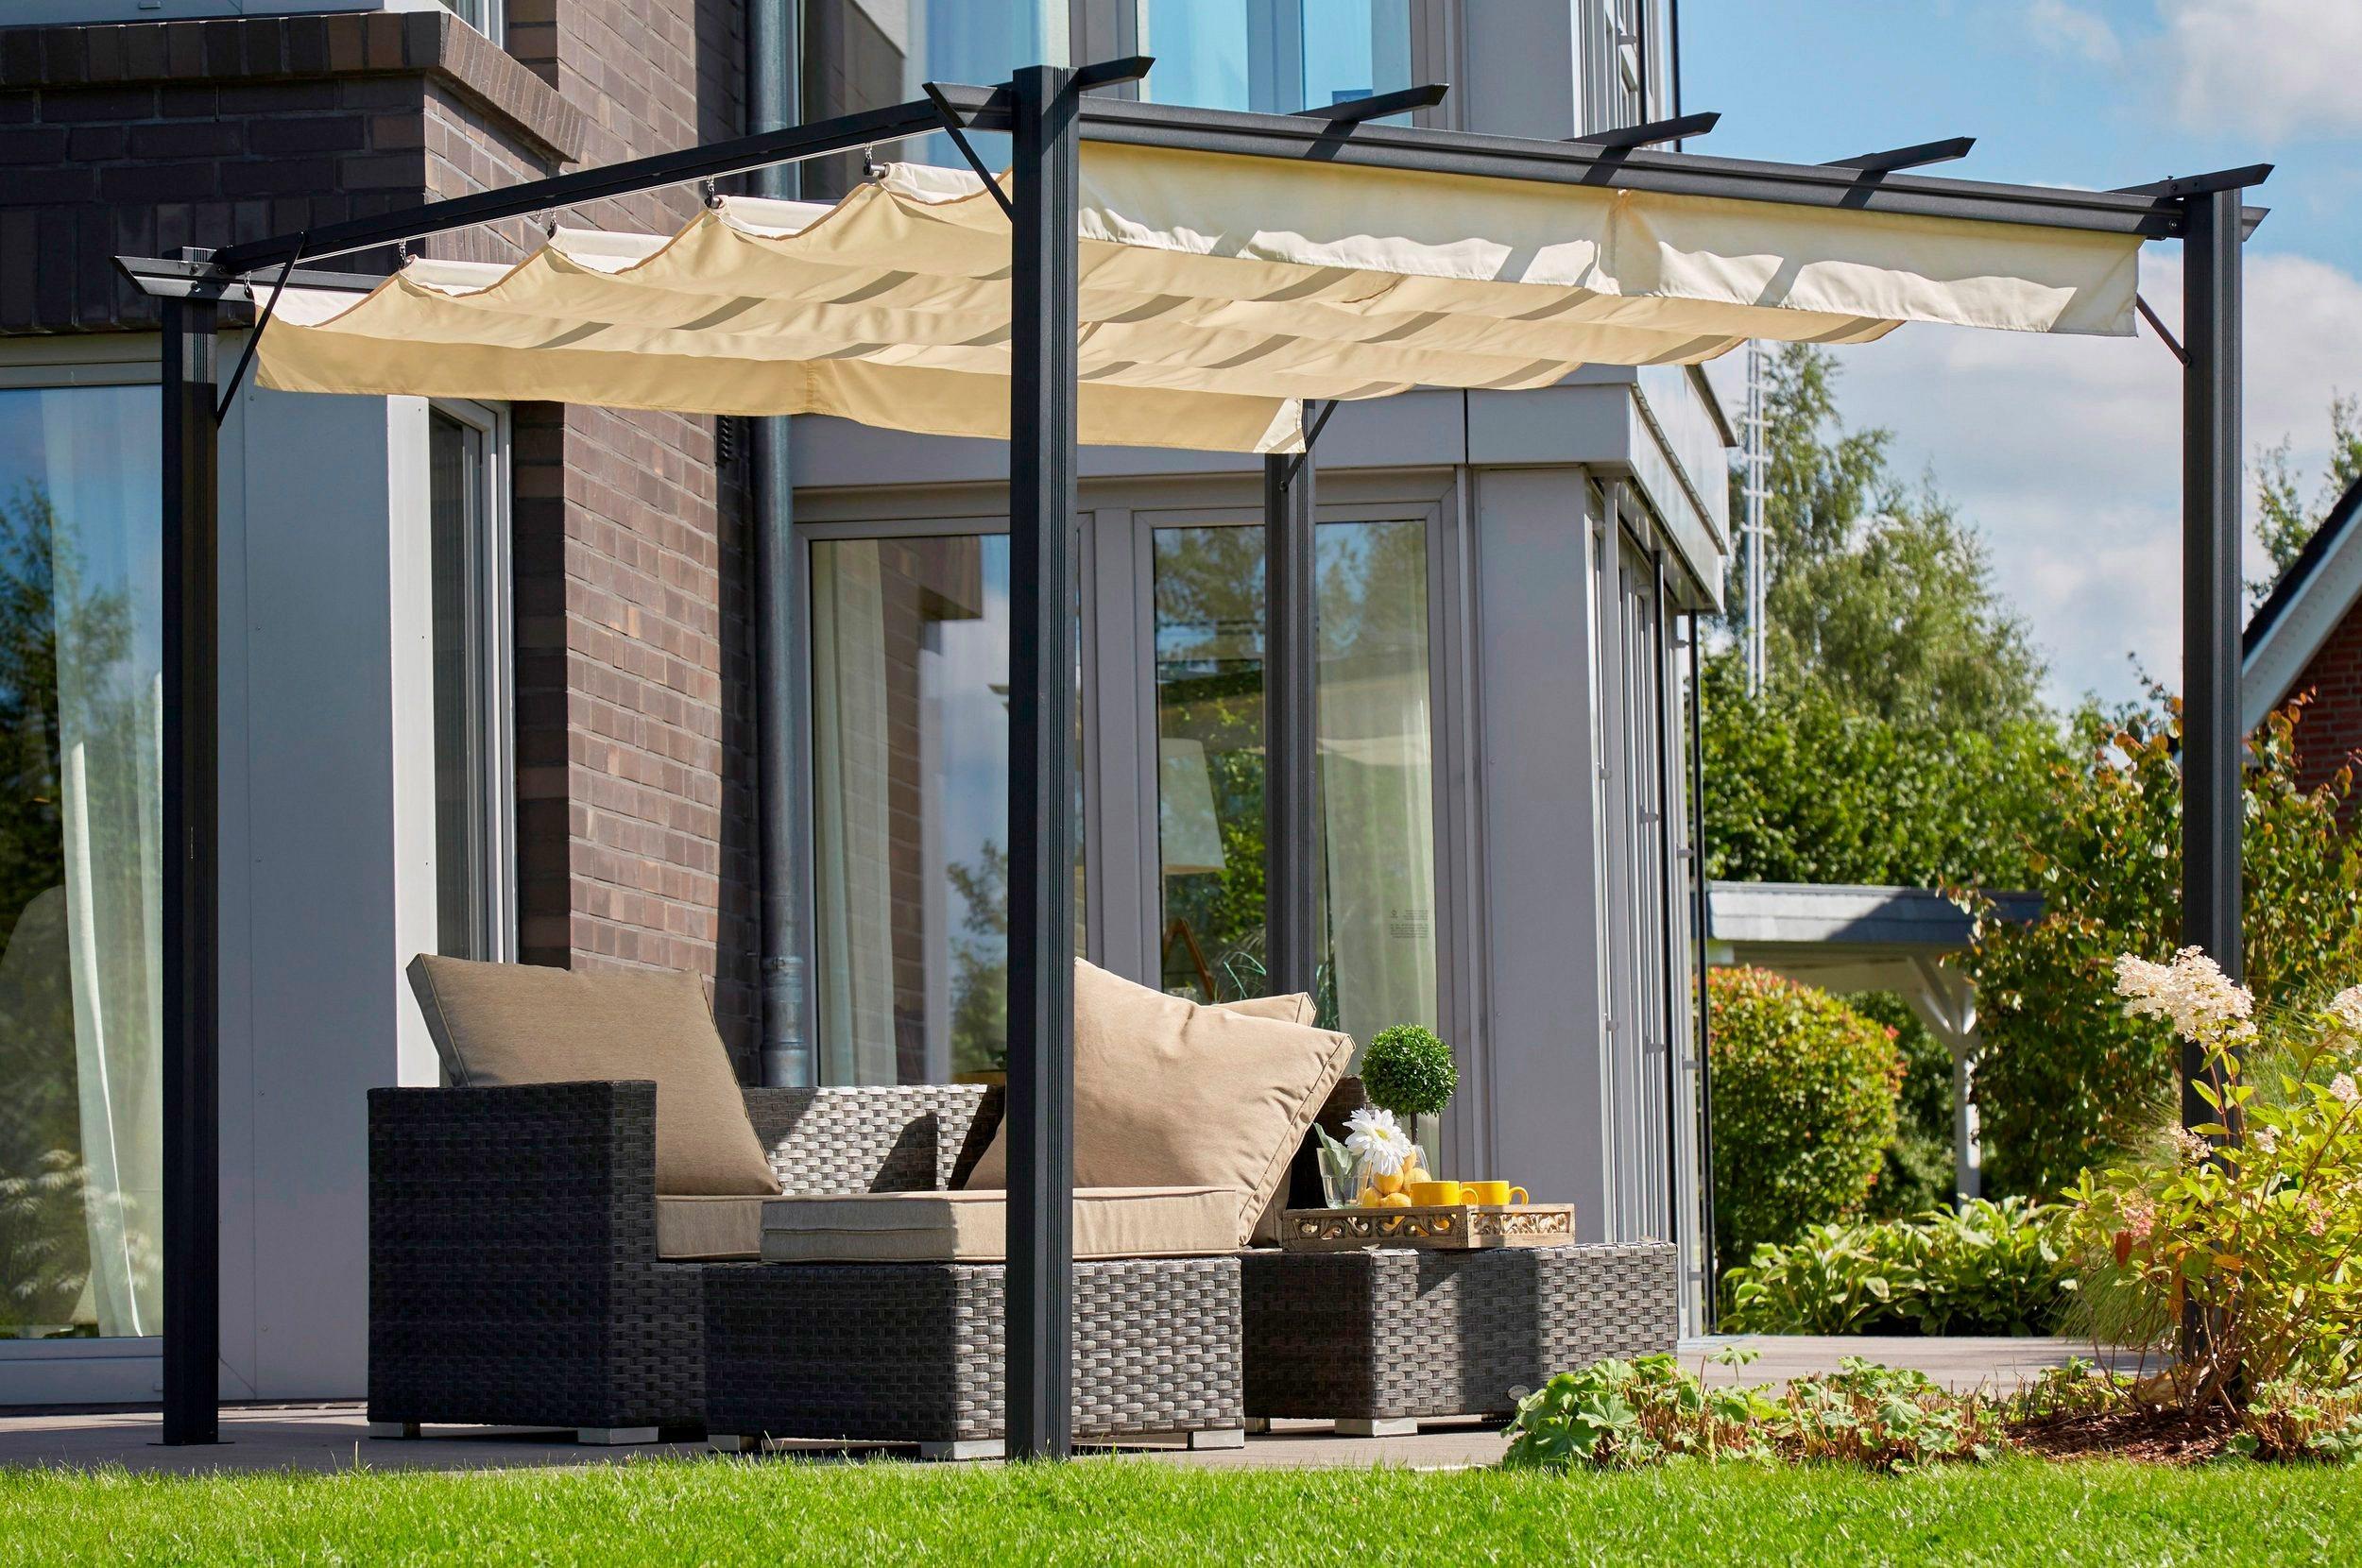 Pavillon »Aluminium«, BxL: 295x295 cm, sandfarben   Garten > Pavillons   Polyester